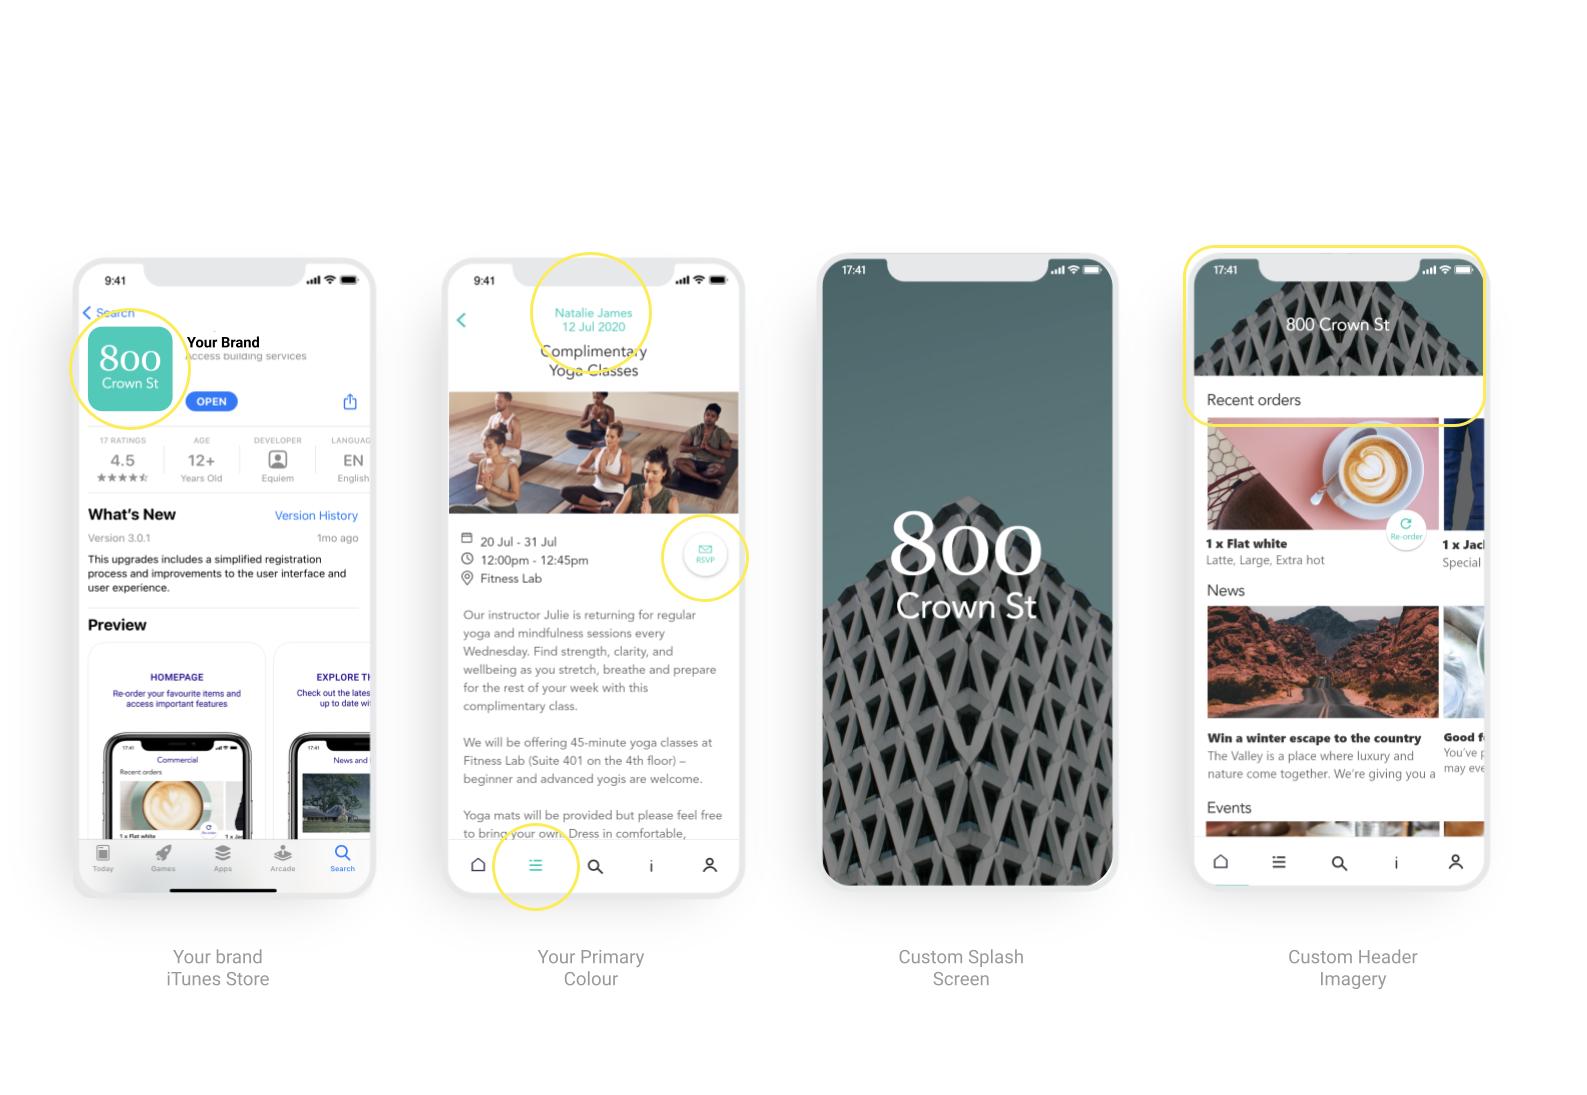 Equiem's custom-branded tenant experience platform.